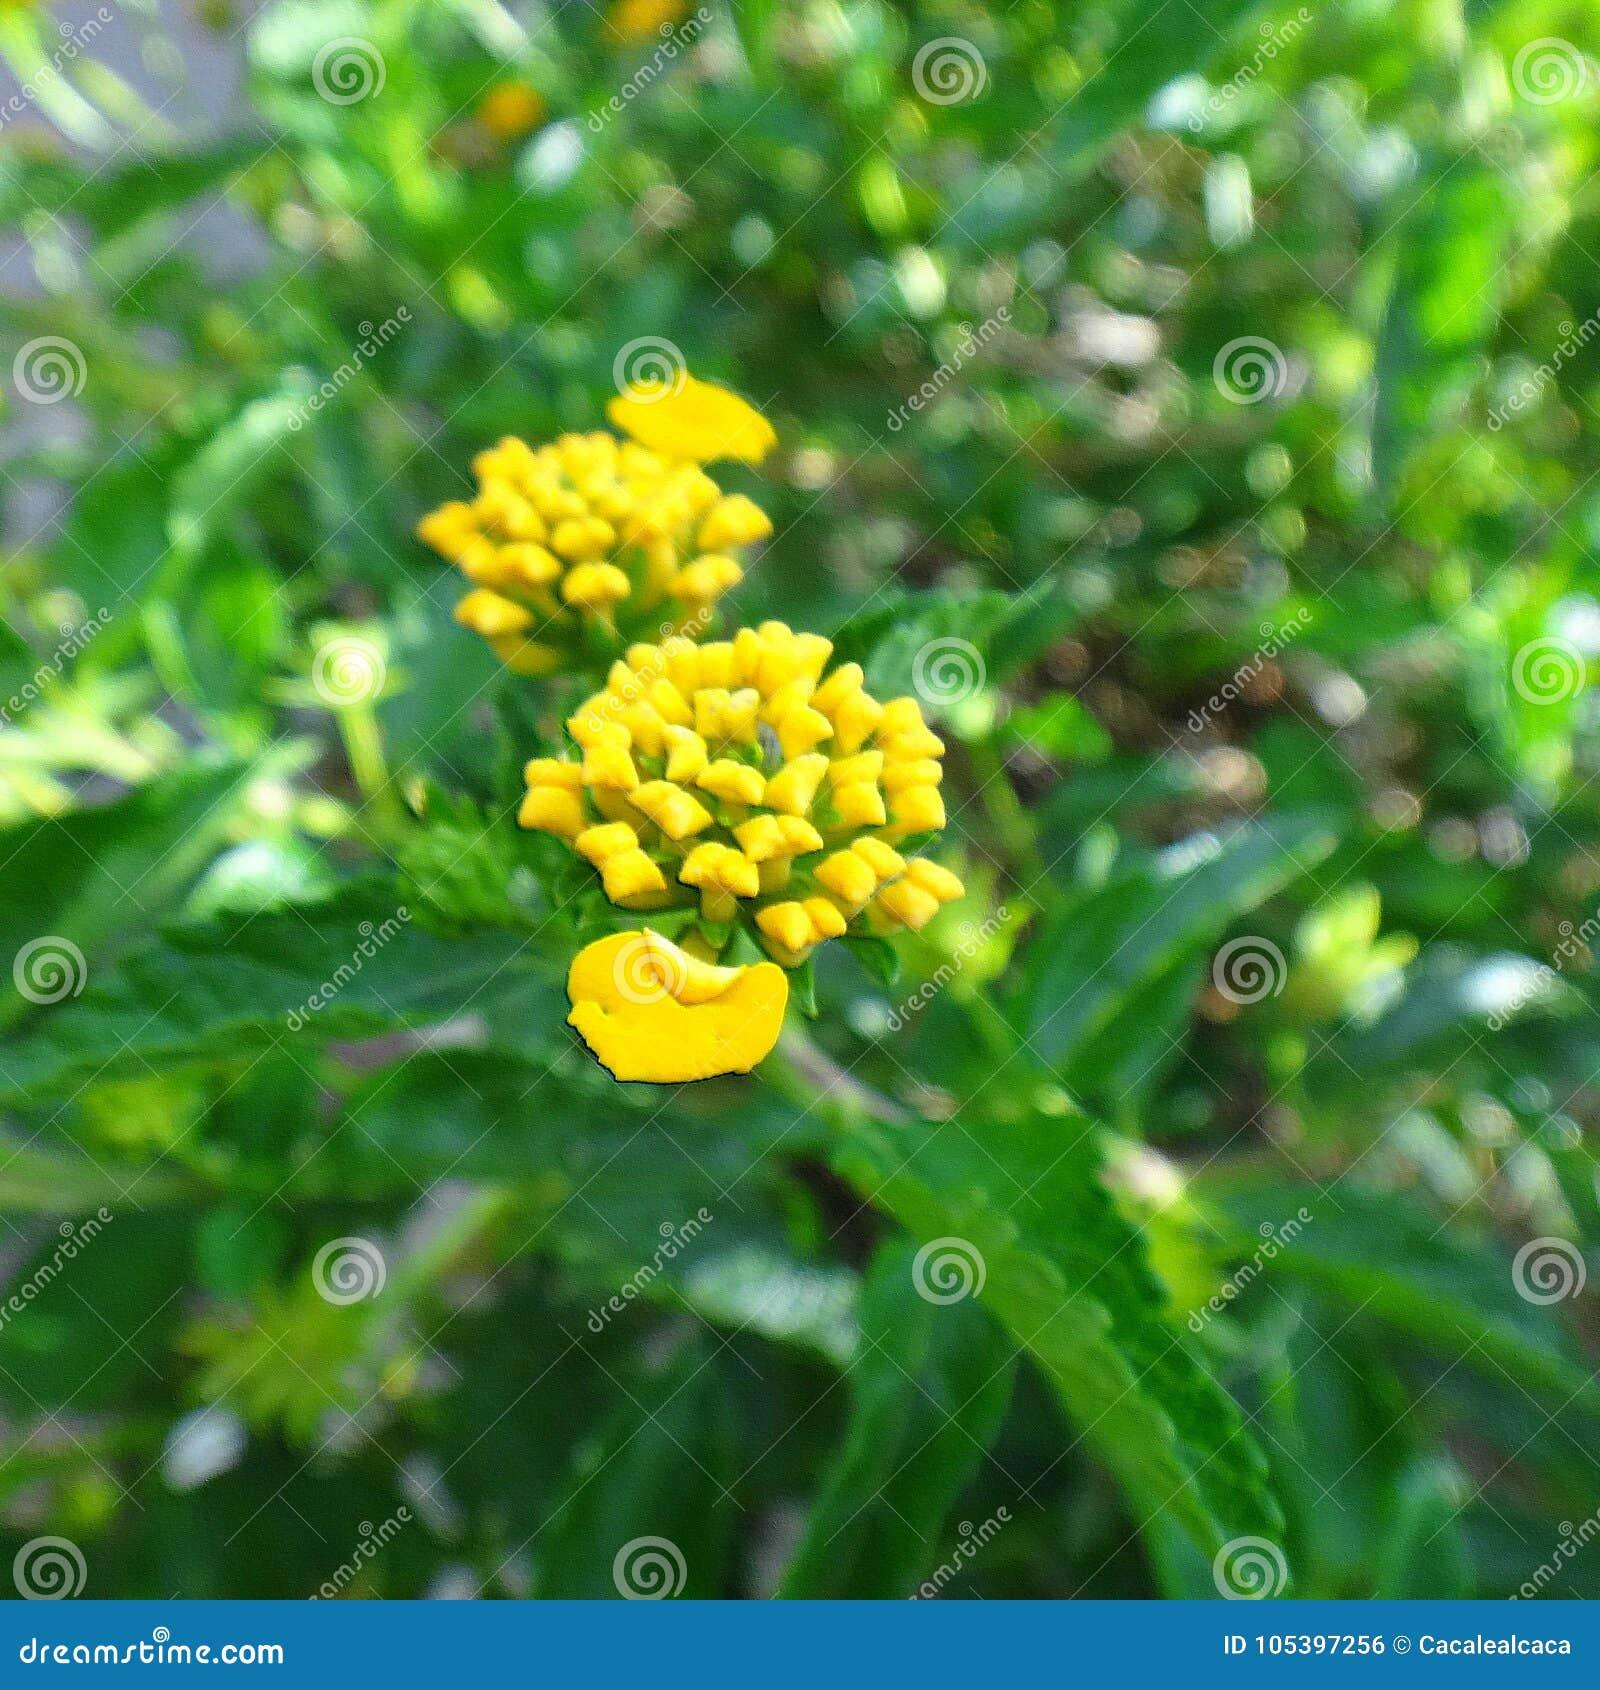 Lantana flowers yellow stock photo image of blossom 105397256 download lantana flowers yellow stock photo image of blossom 105397256 mightylinksfo